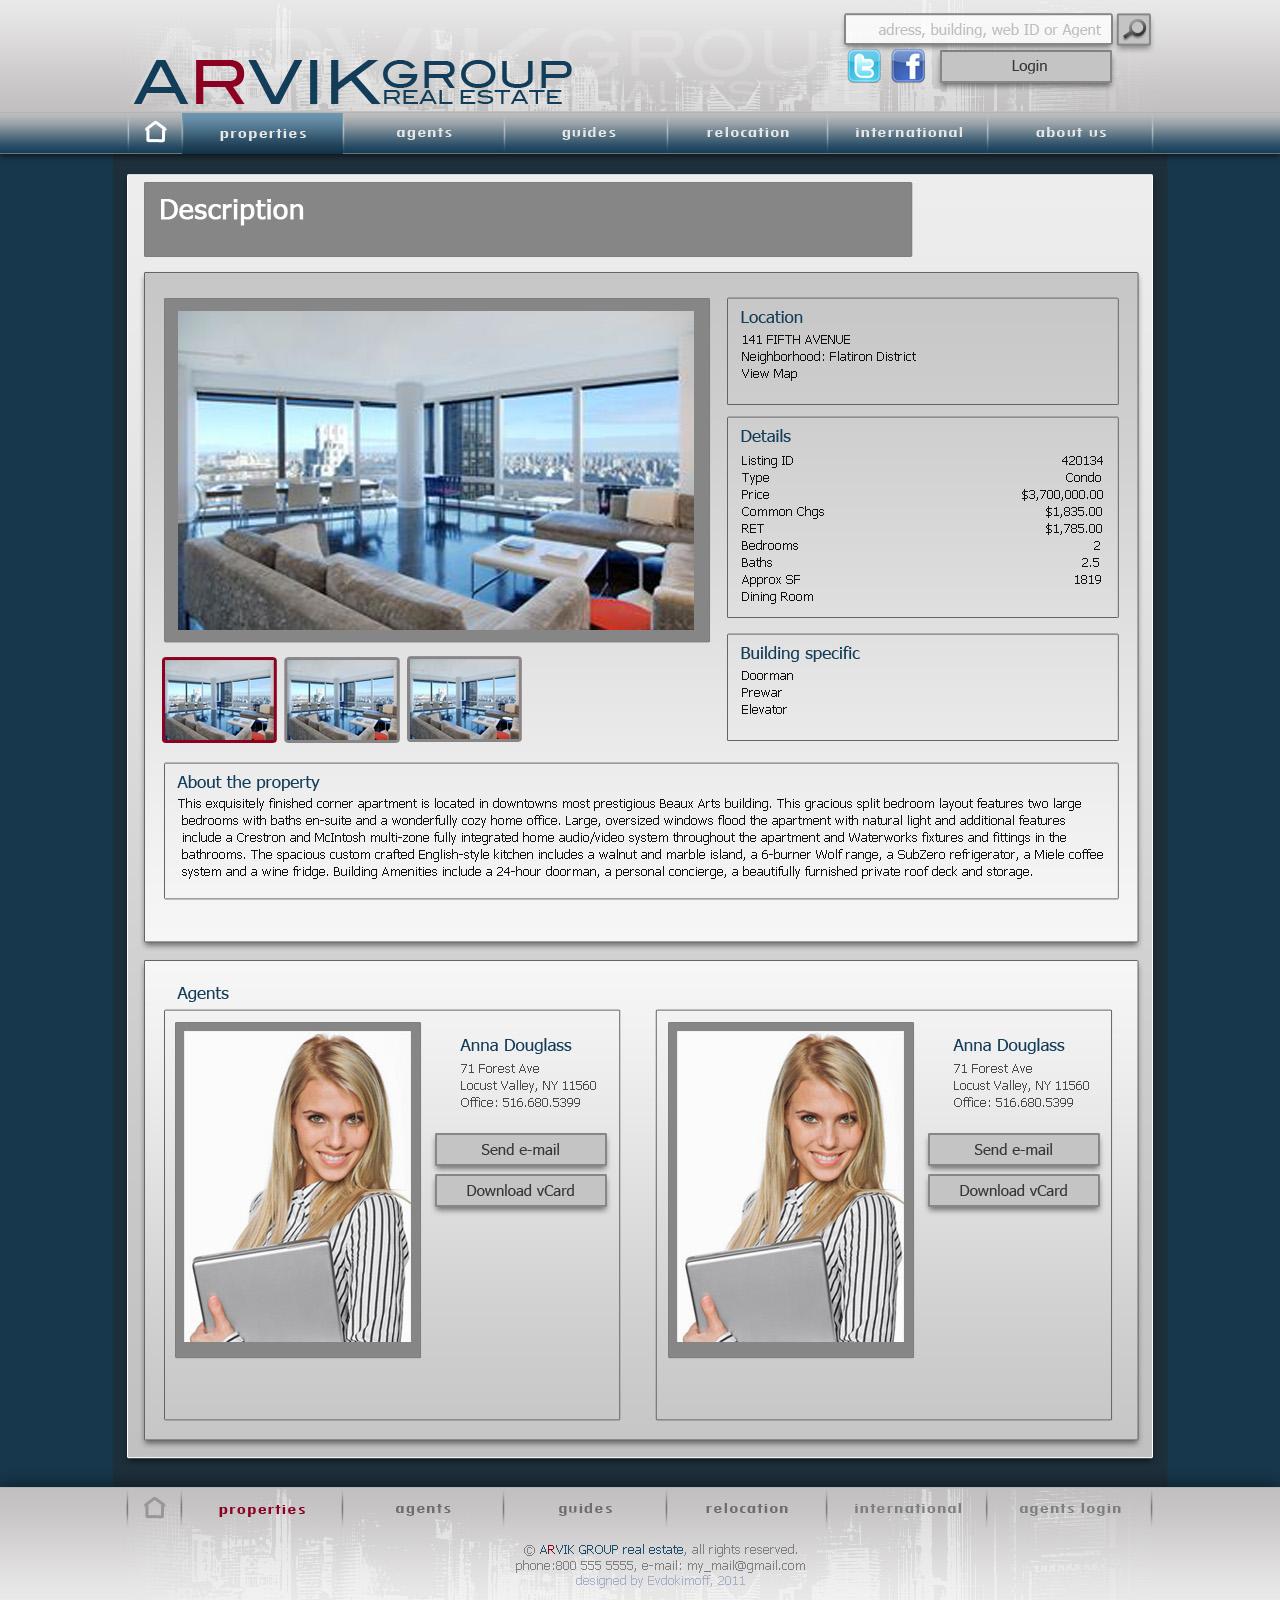 arvik group real estate